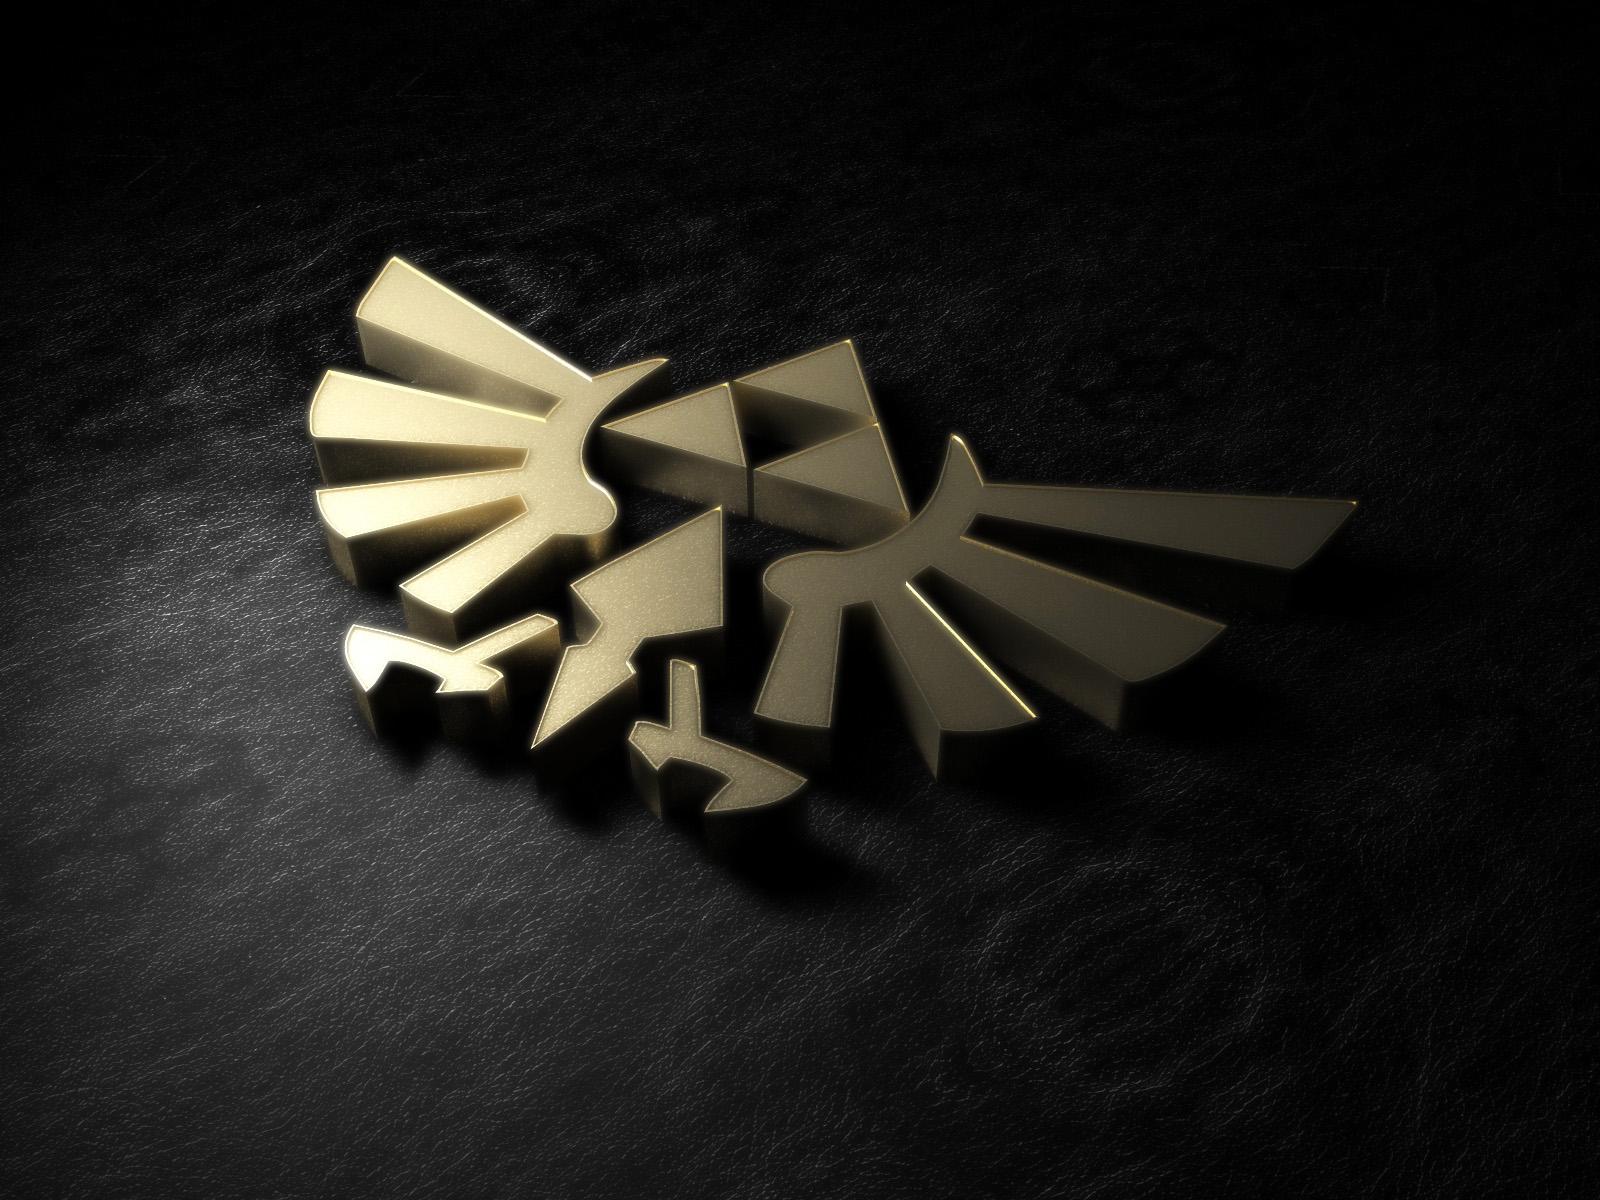 Triforce The Legend of Zelda wallpaper 1600x1200 66129 1600x1200